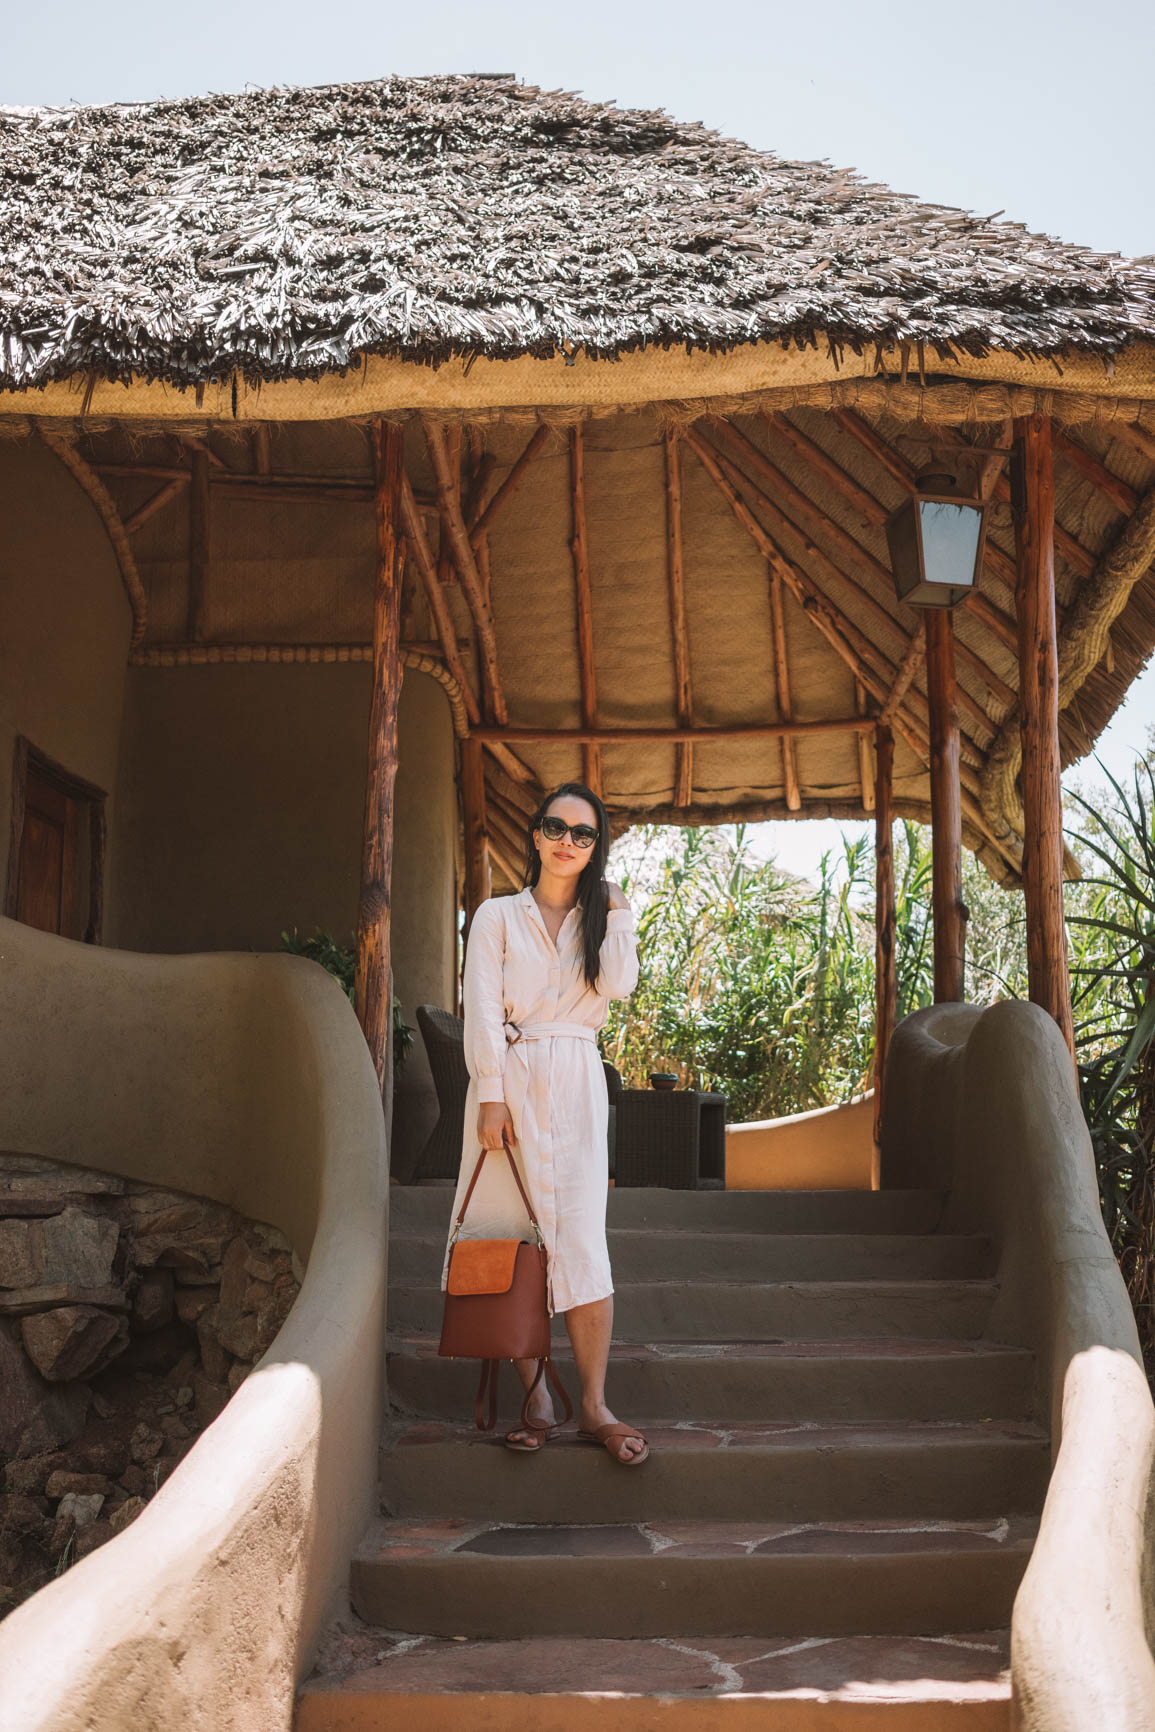 African Safari packing list - under 33 lbs